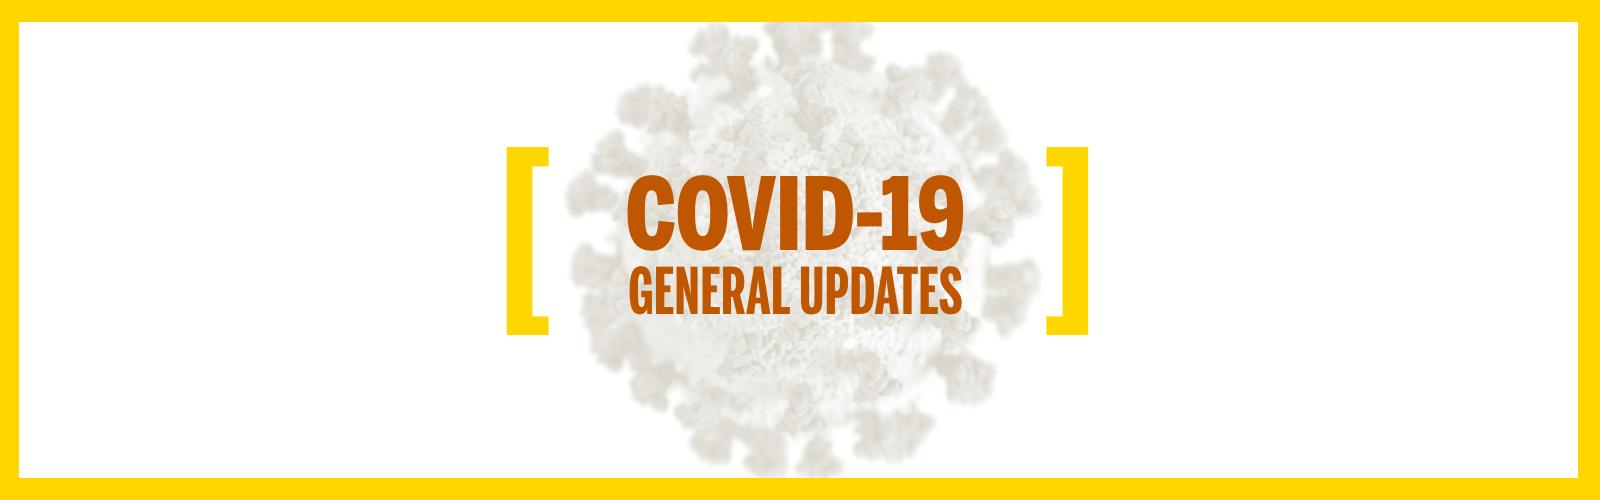 COVID-19 general updates graphic